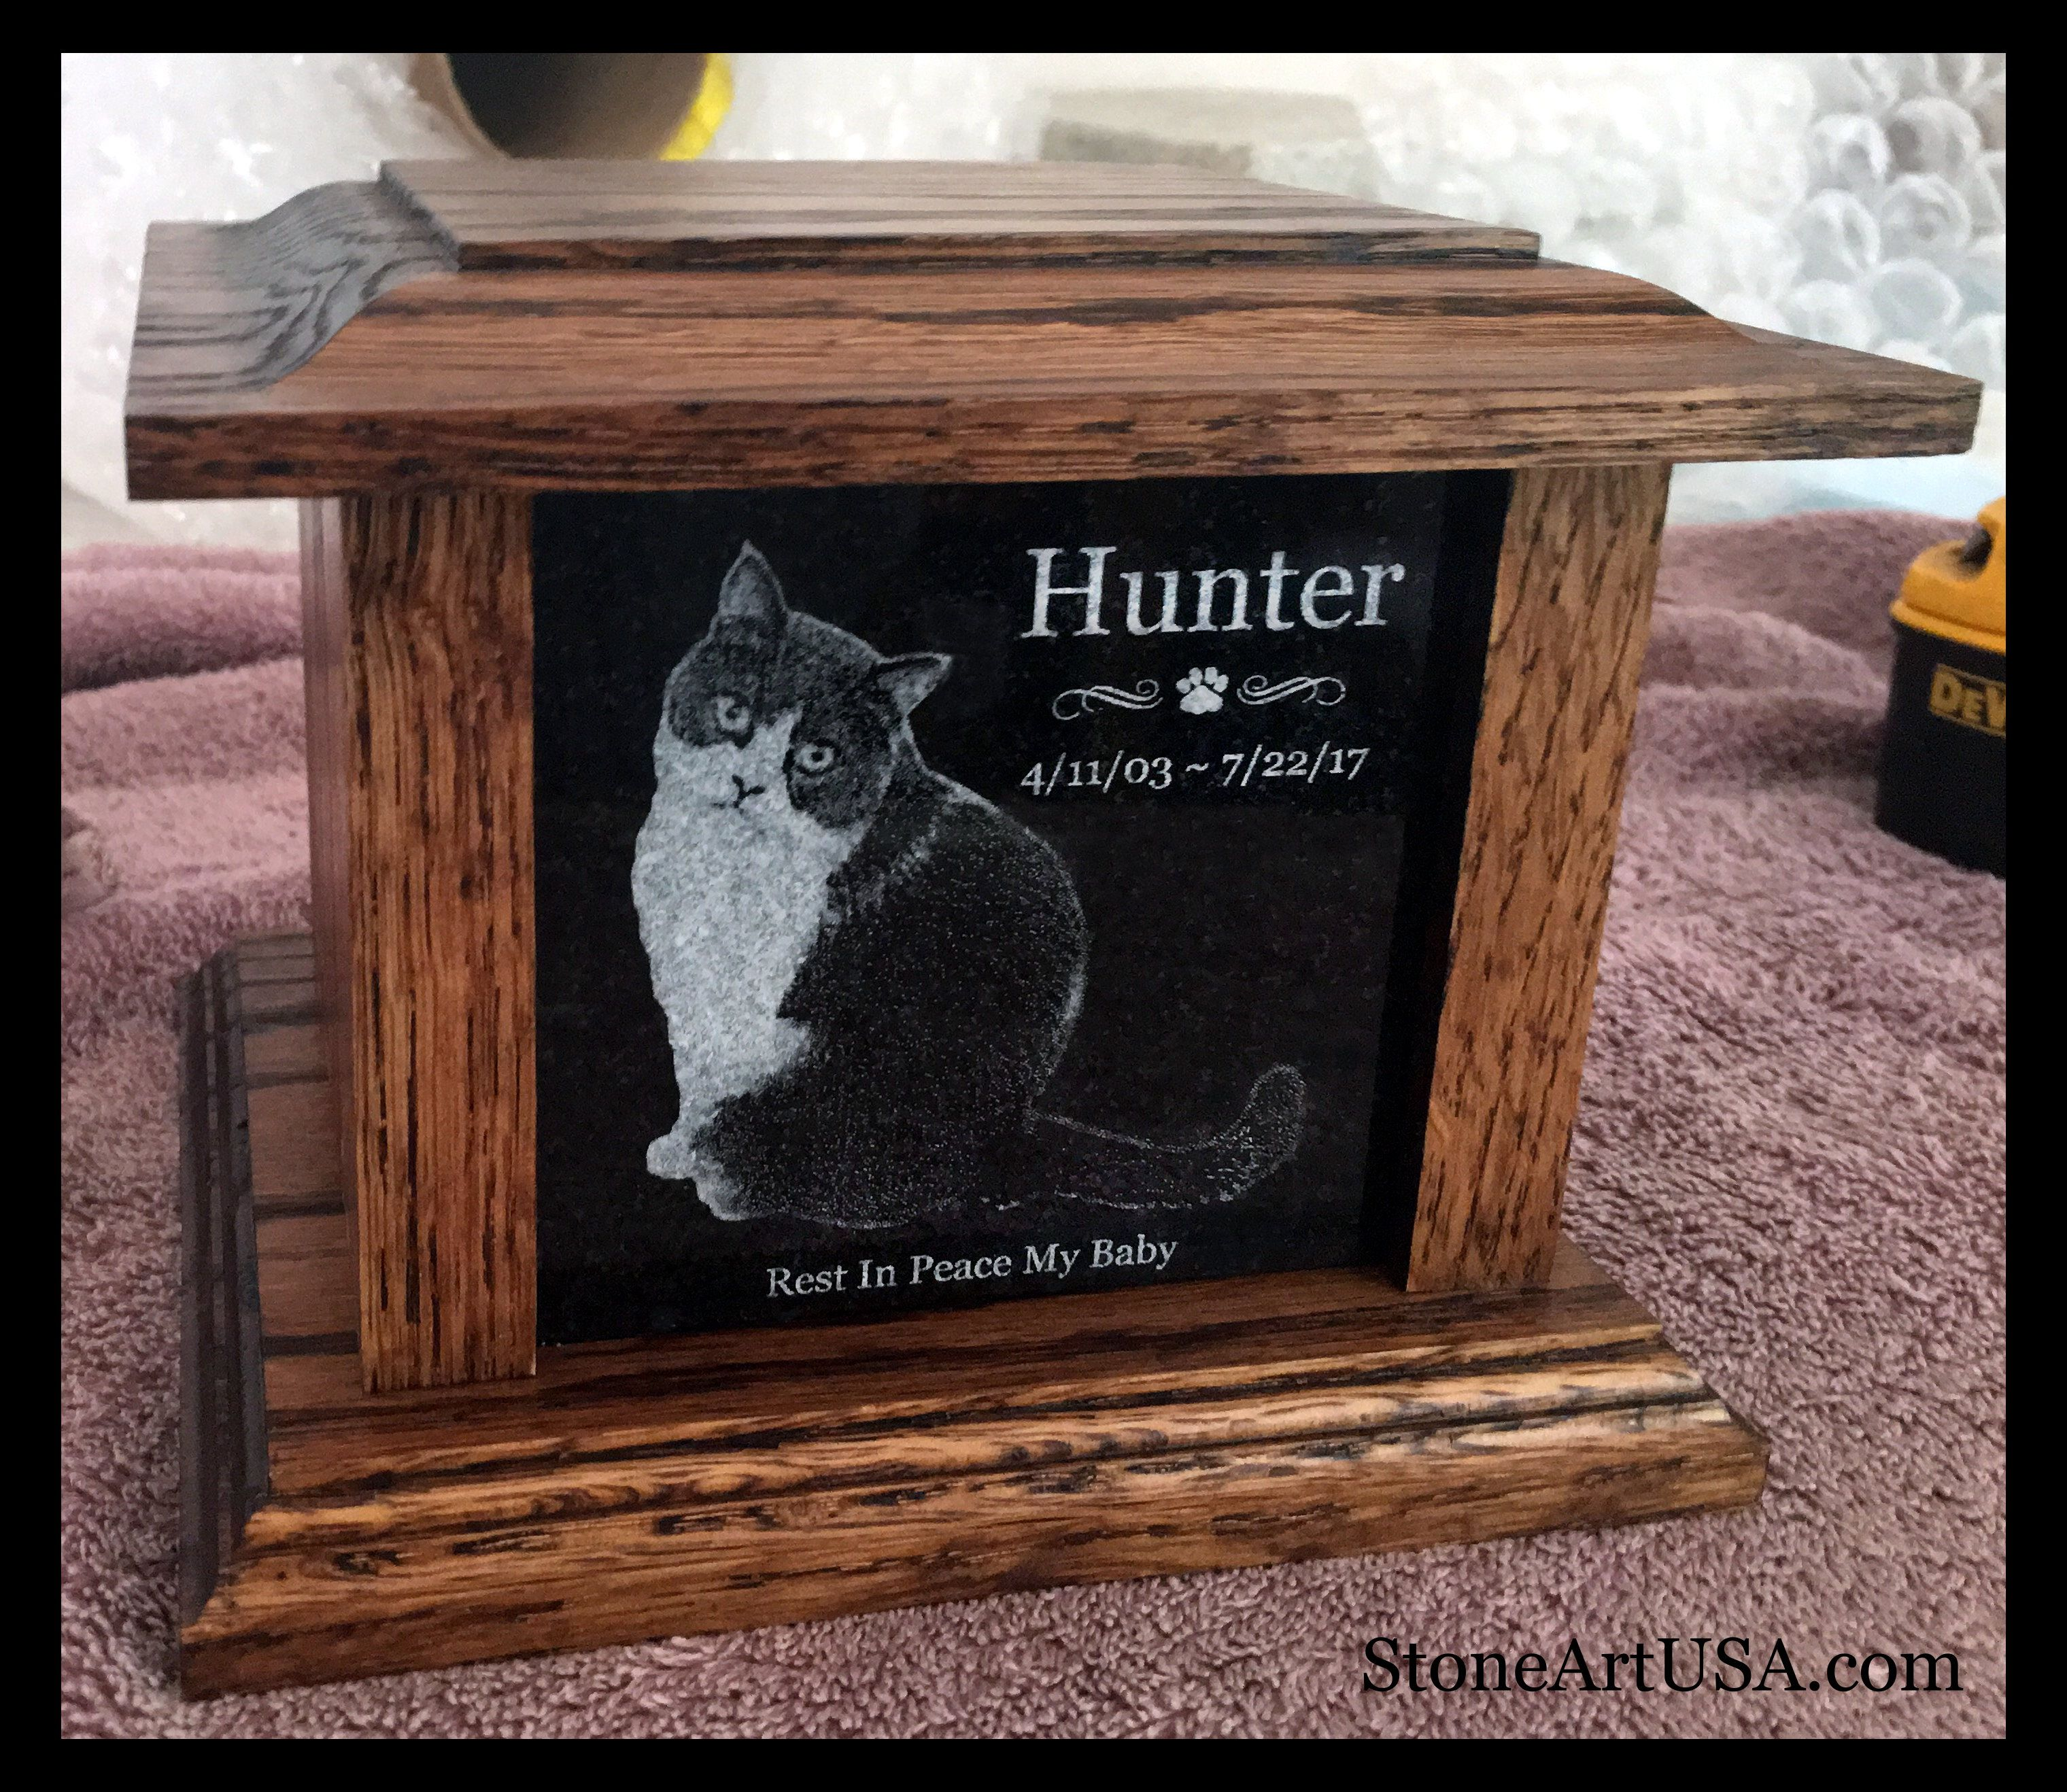 R I P Hunter Small Oak Granite Urn W Dark Stain Hi Eric The Urn Arrived Safely Today It Pet Urns Cat Custom Pet Memorials Granite Pet Memorials